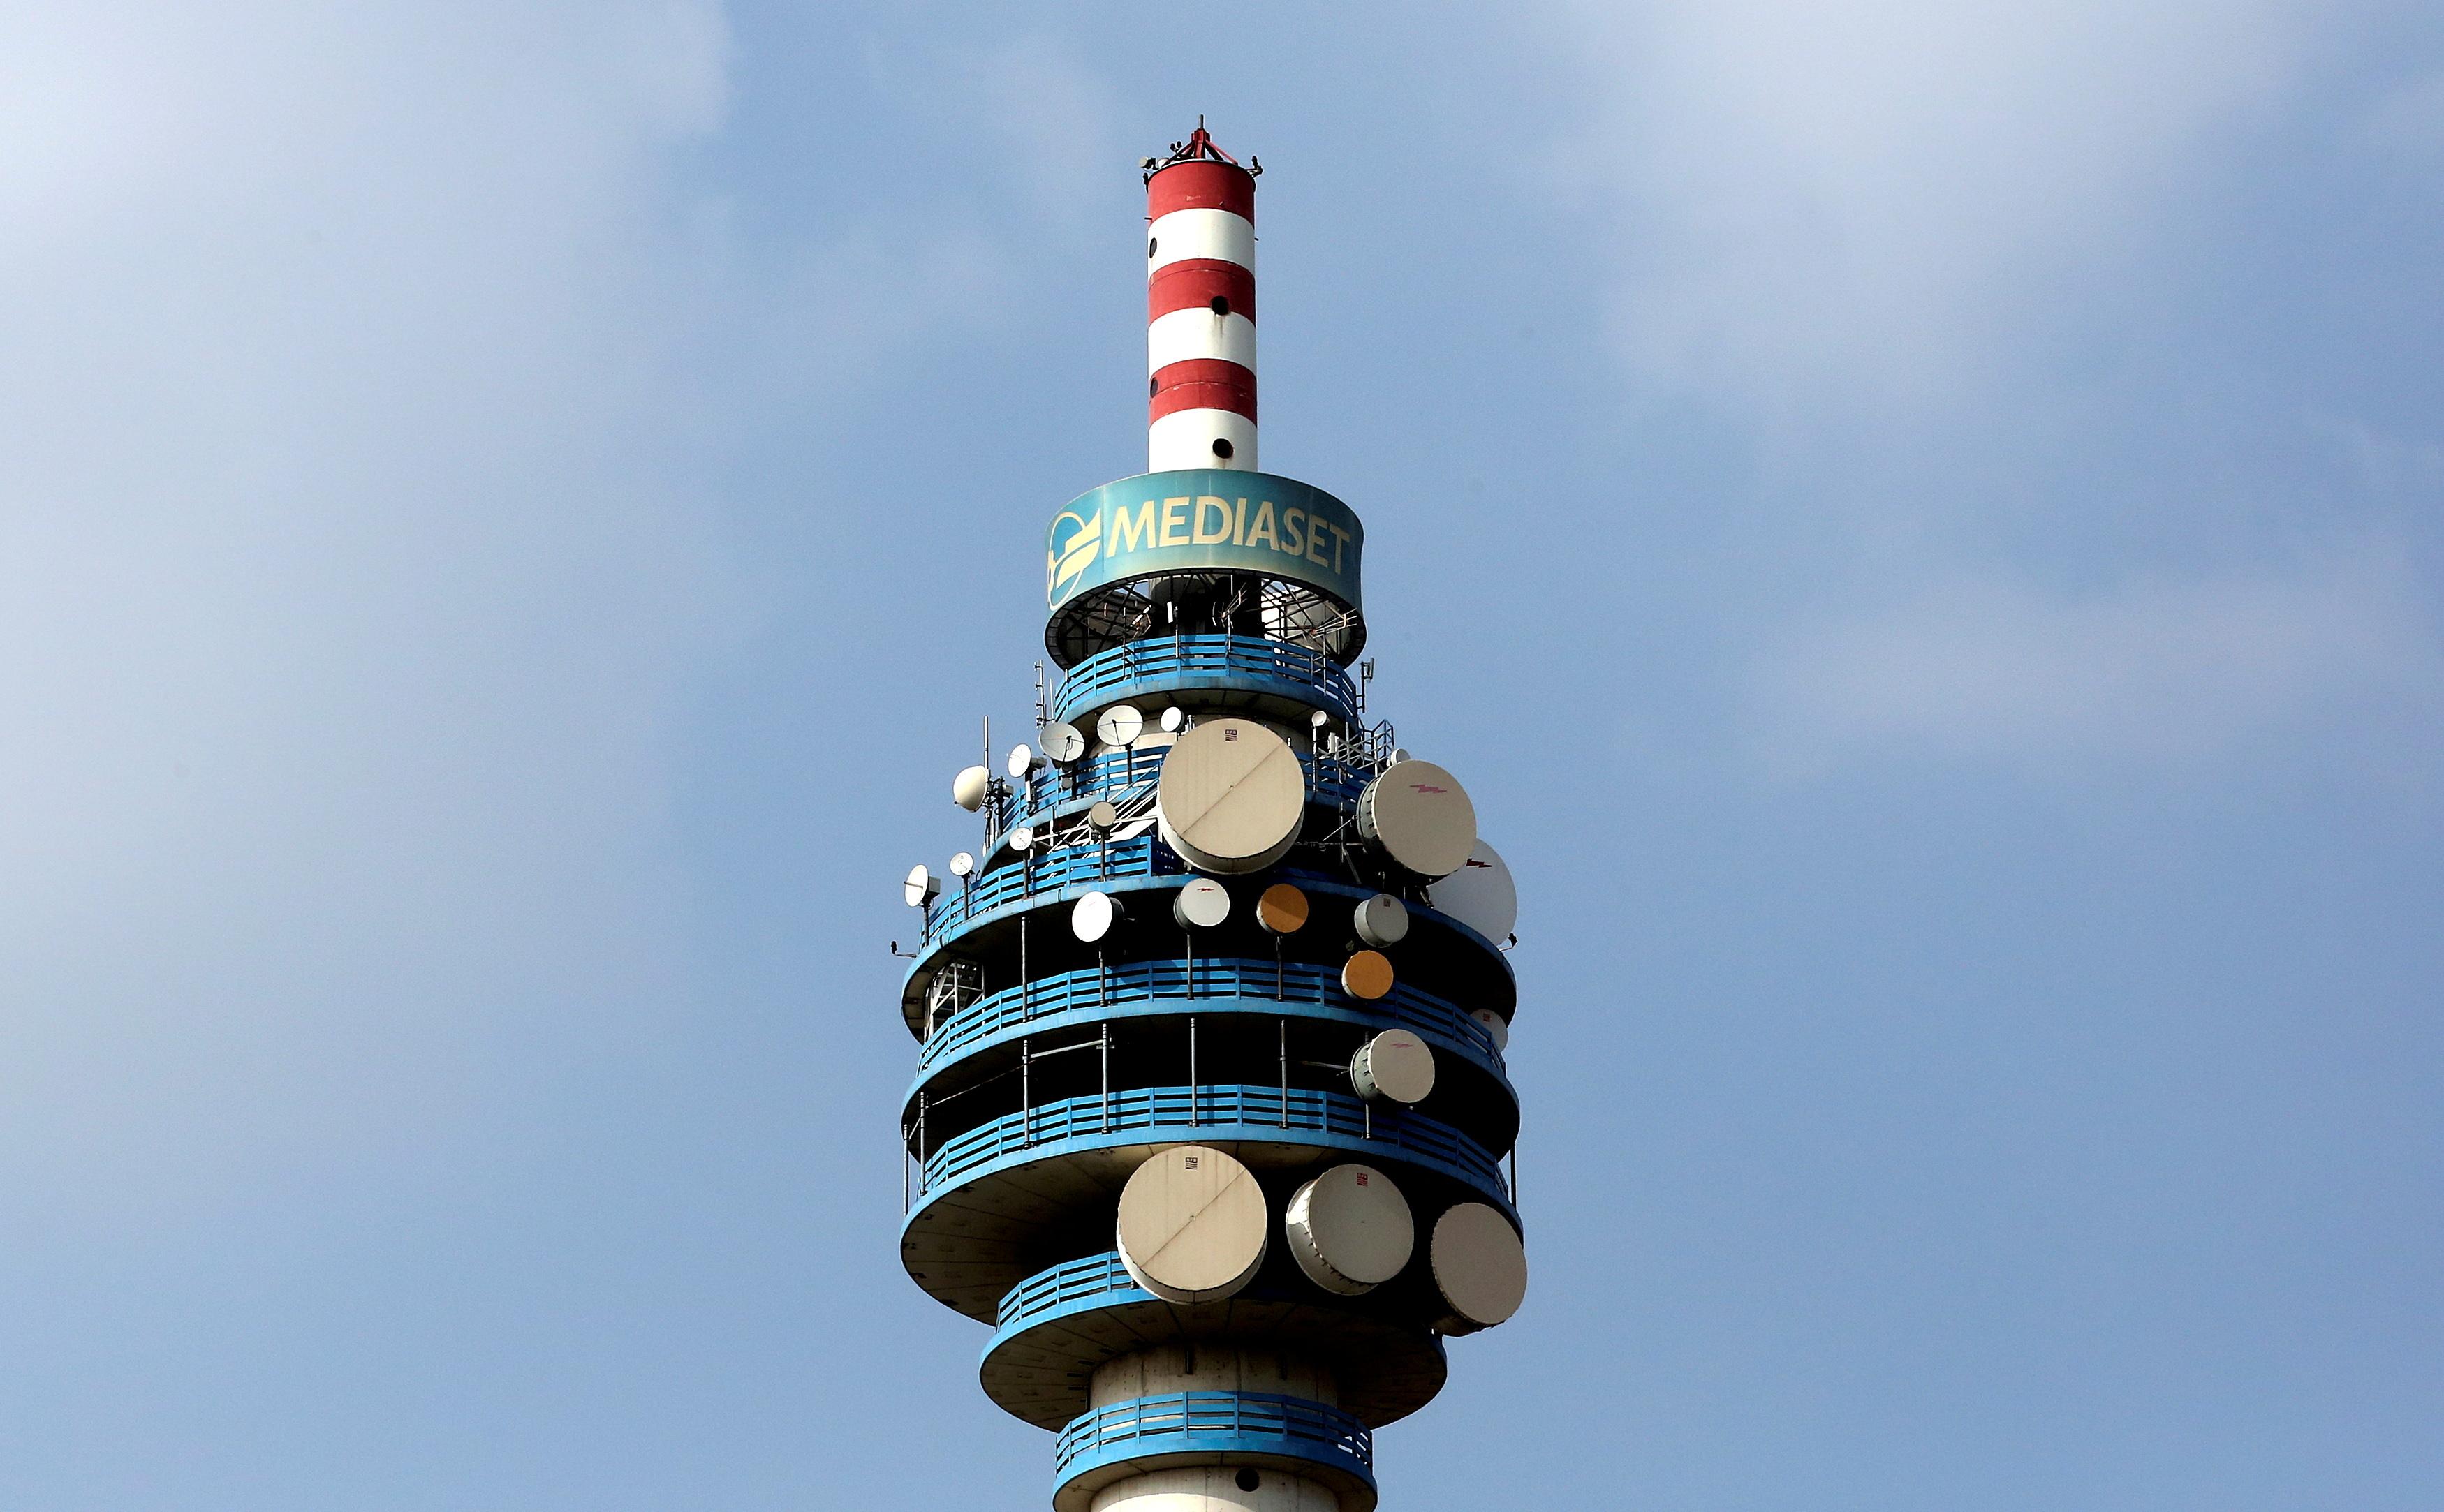 Torre de Mediaset en Cologno Monzese, en MIlán.